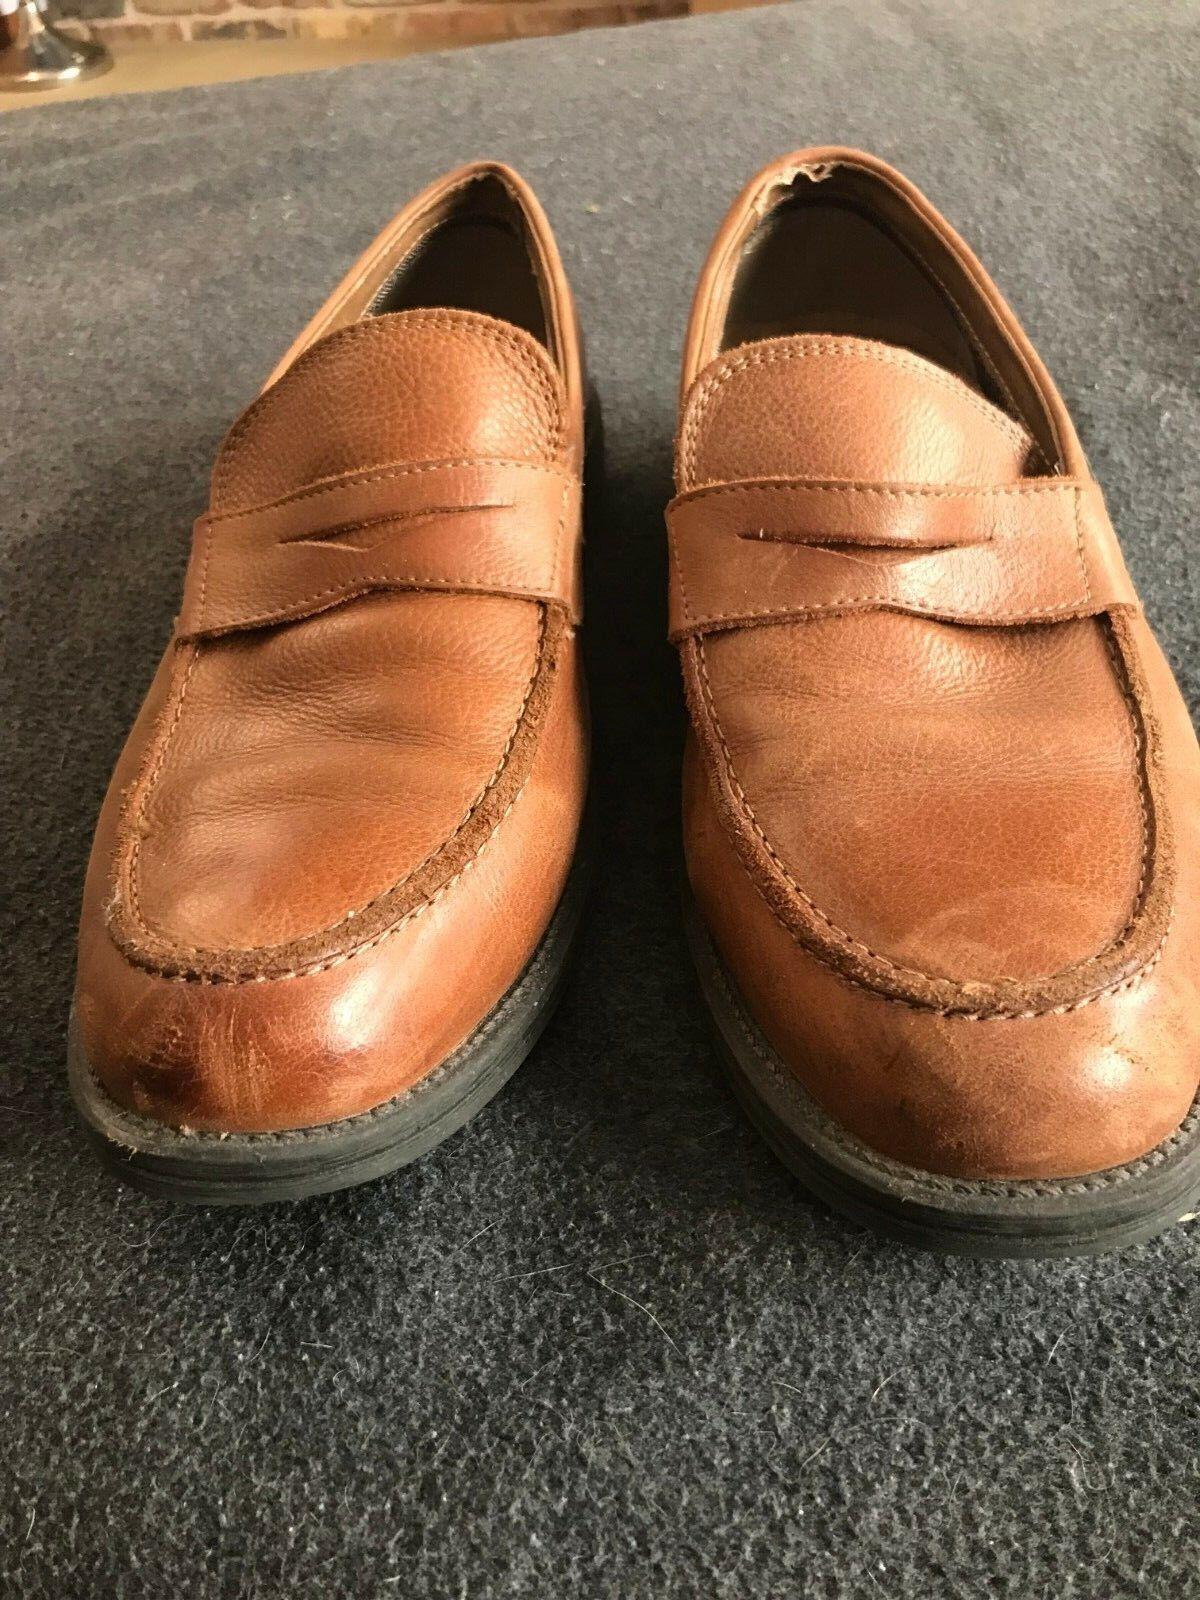 Bass slip on braun braun braun Größe 9 1 2 loafer, nice schuhe gentle wear. fd8e60